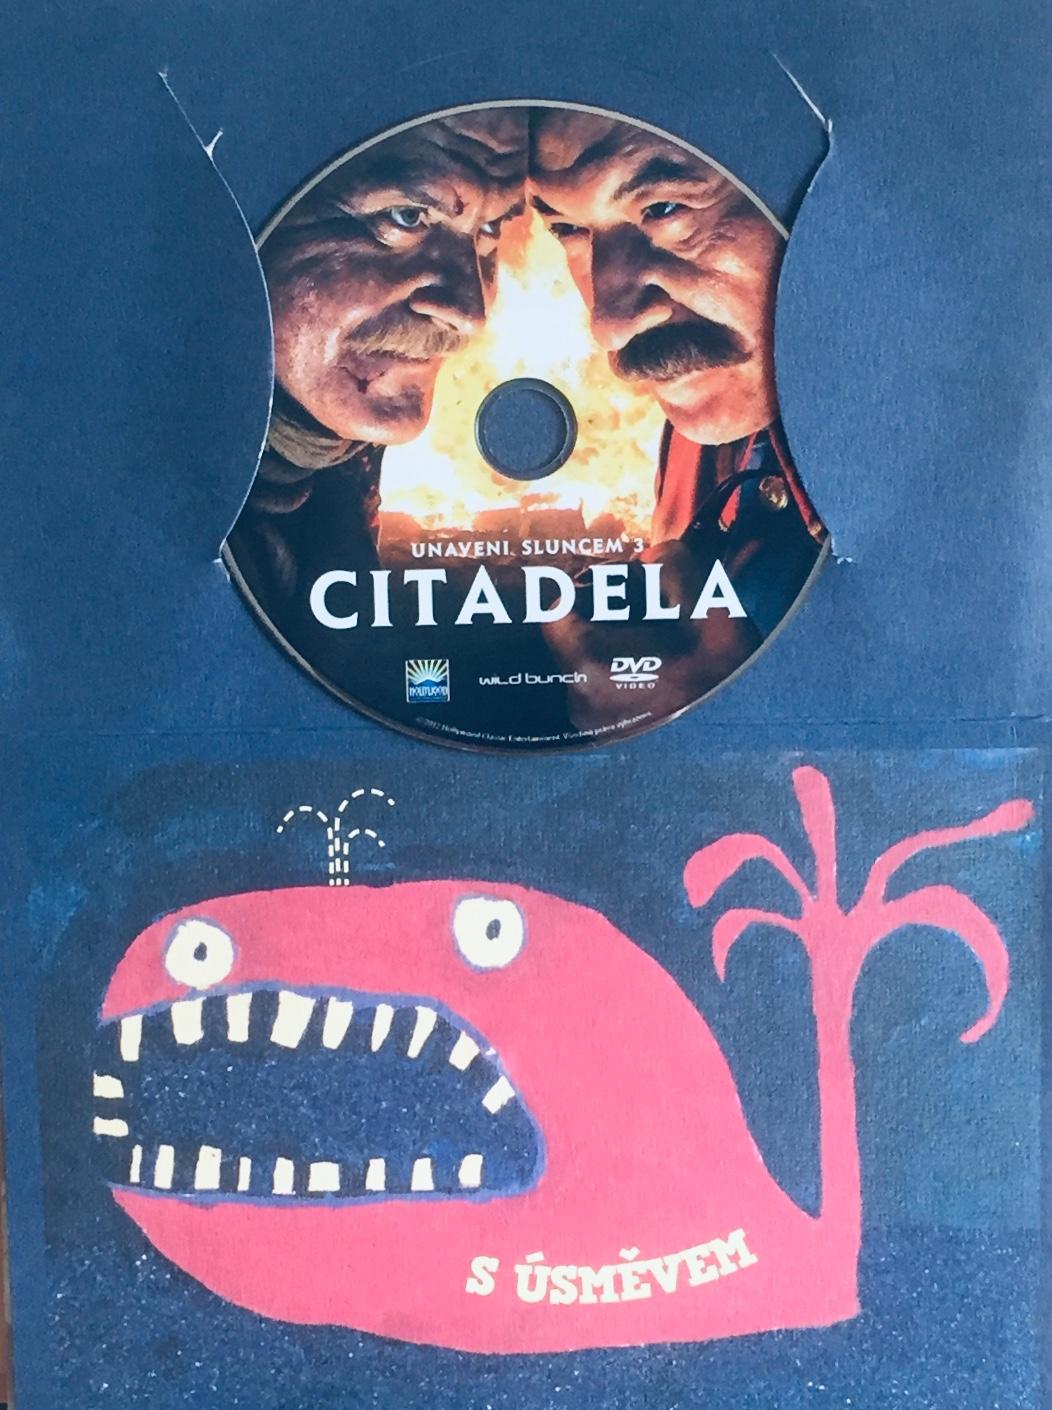 Citadela - Unaveni sluncem 3 - DVD /dárkový obal/